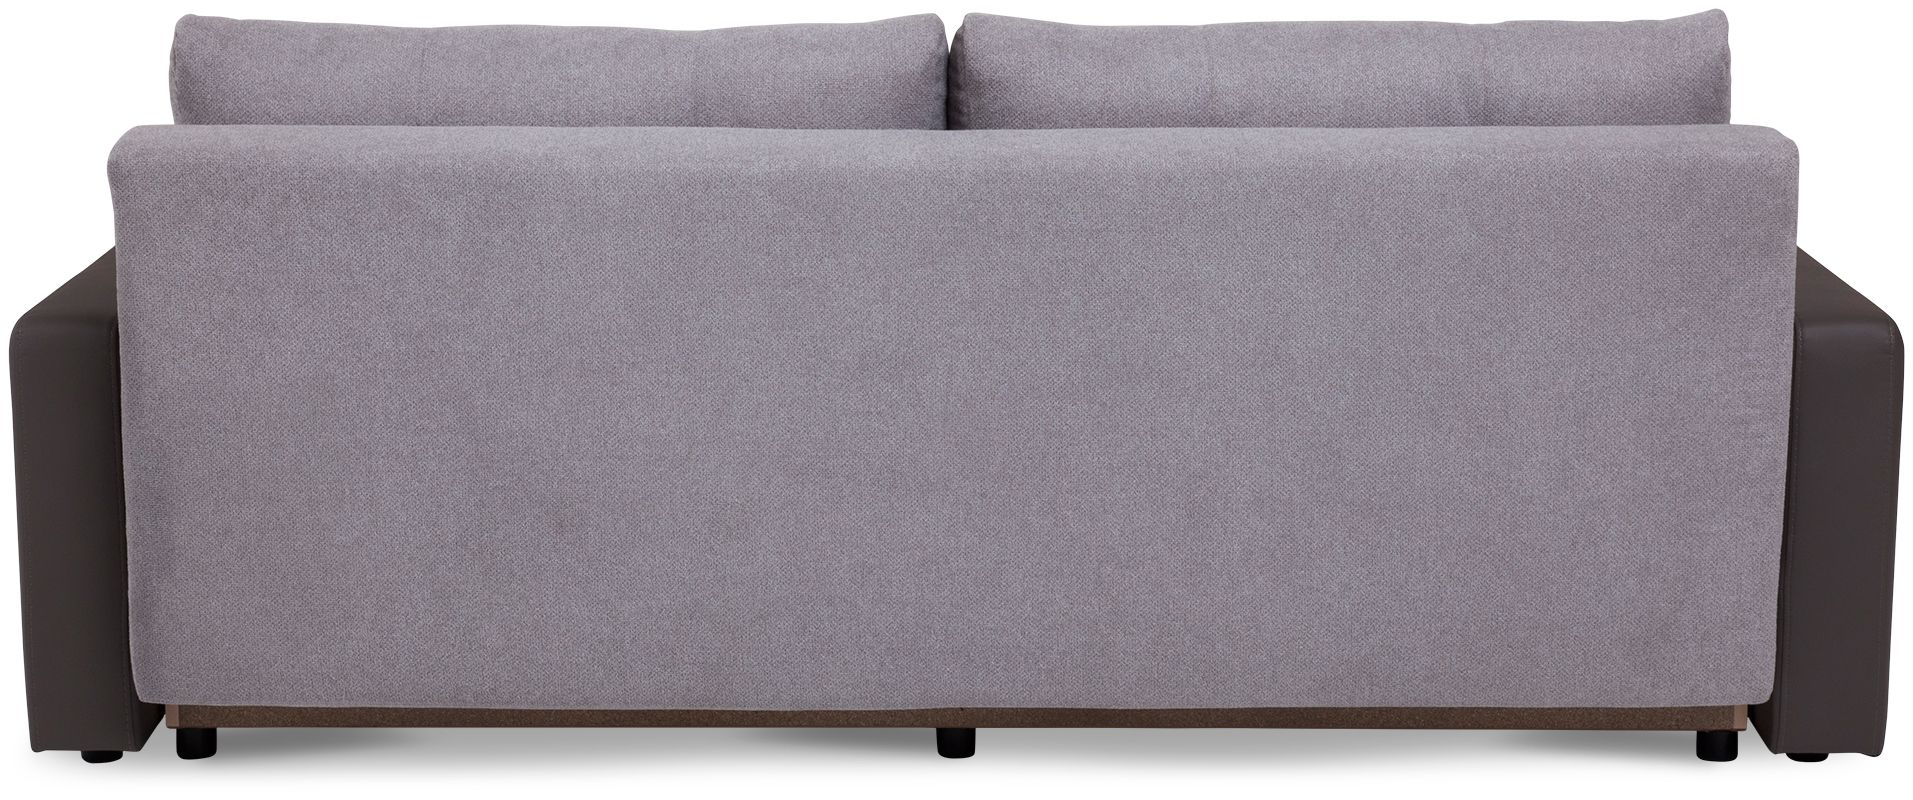 sofa aro 13